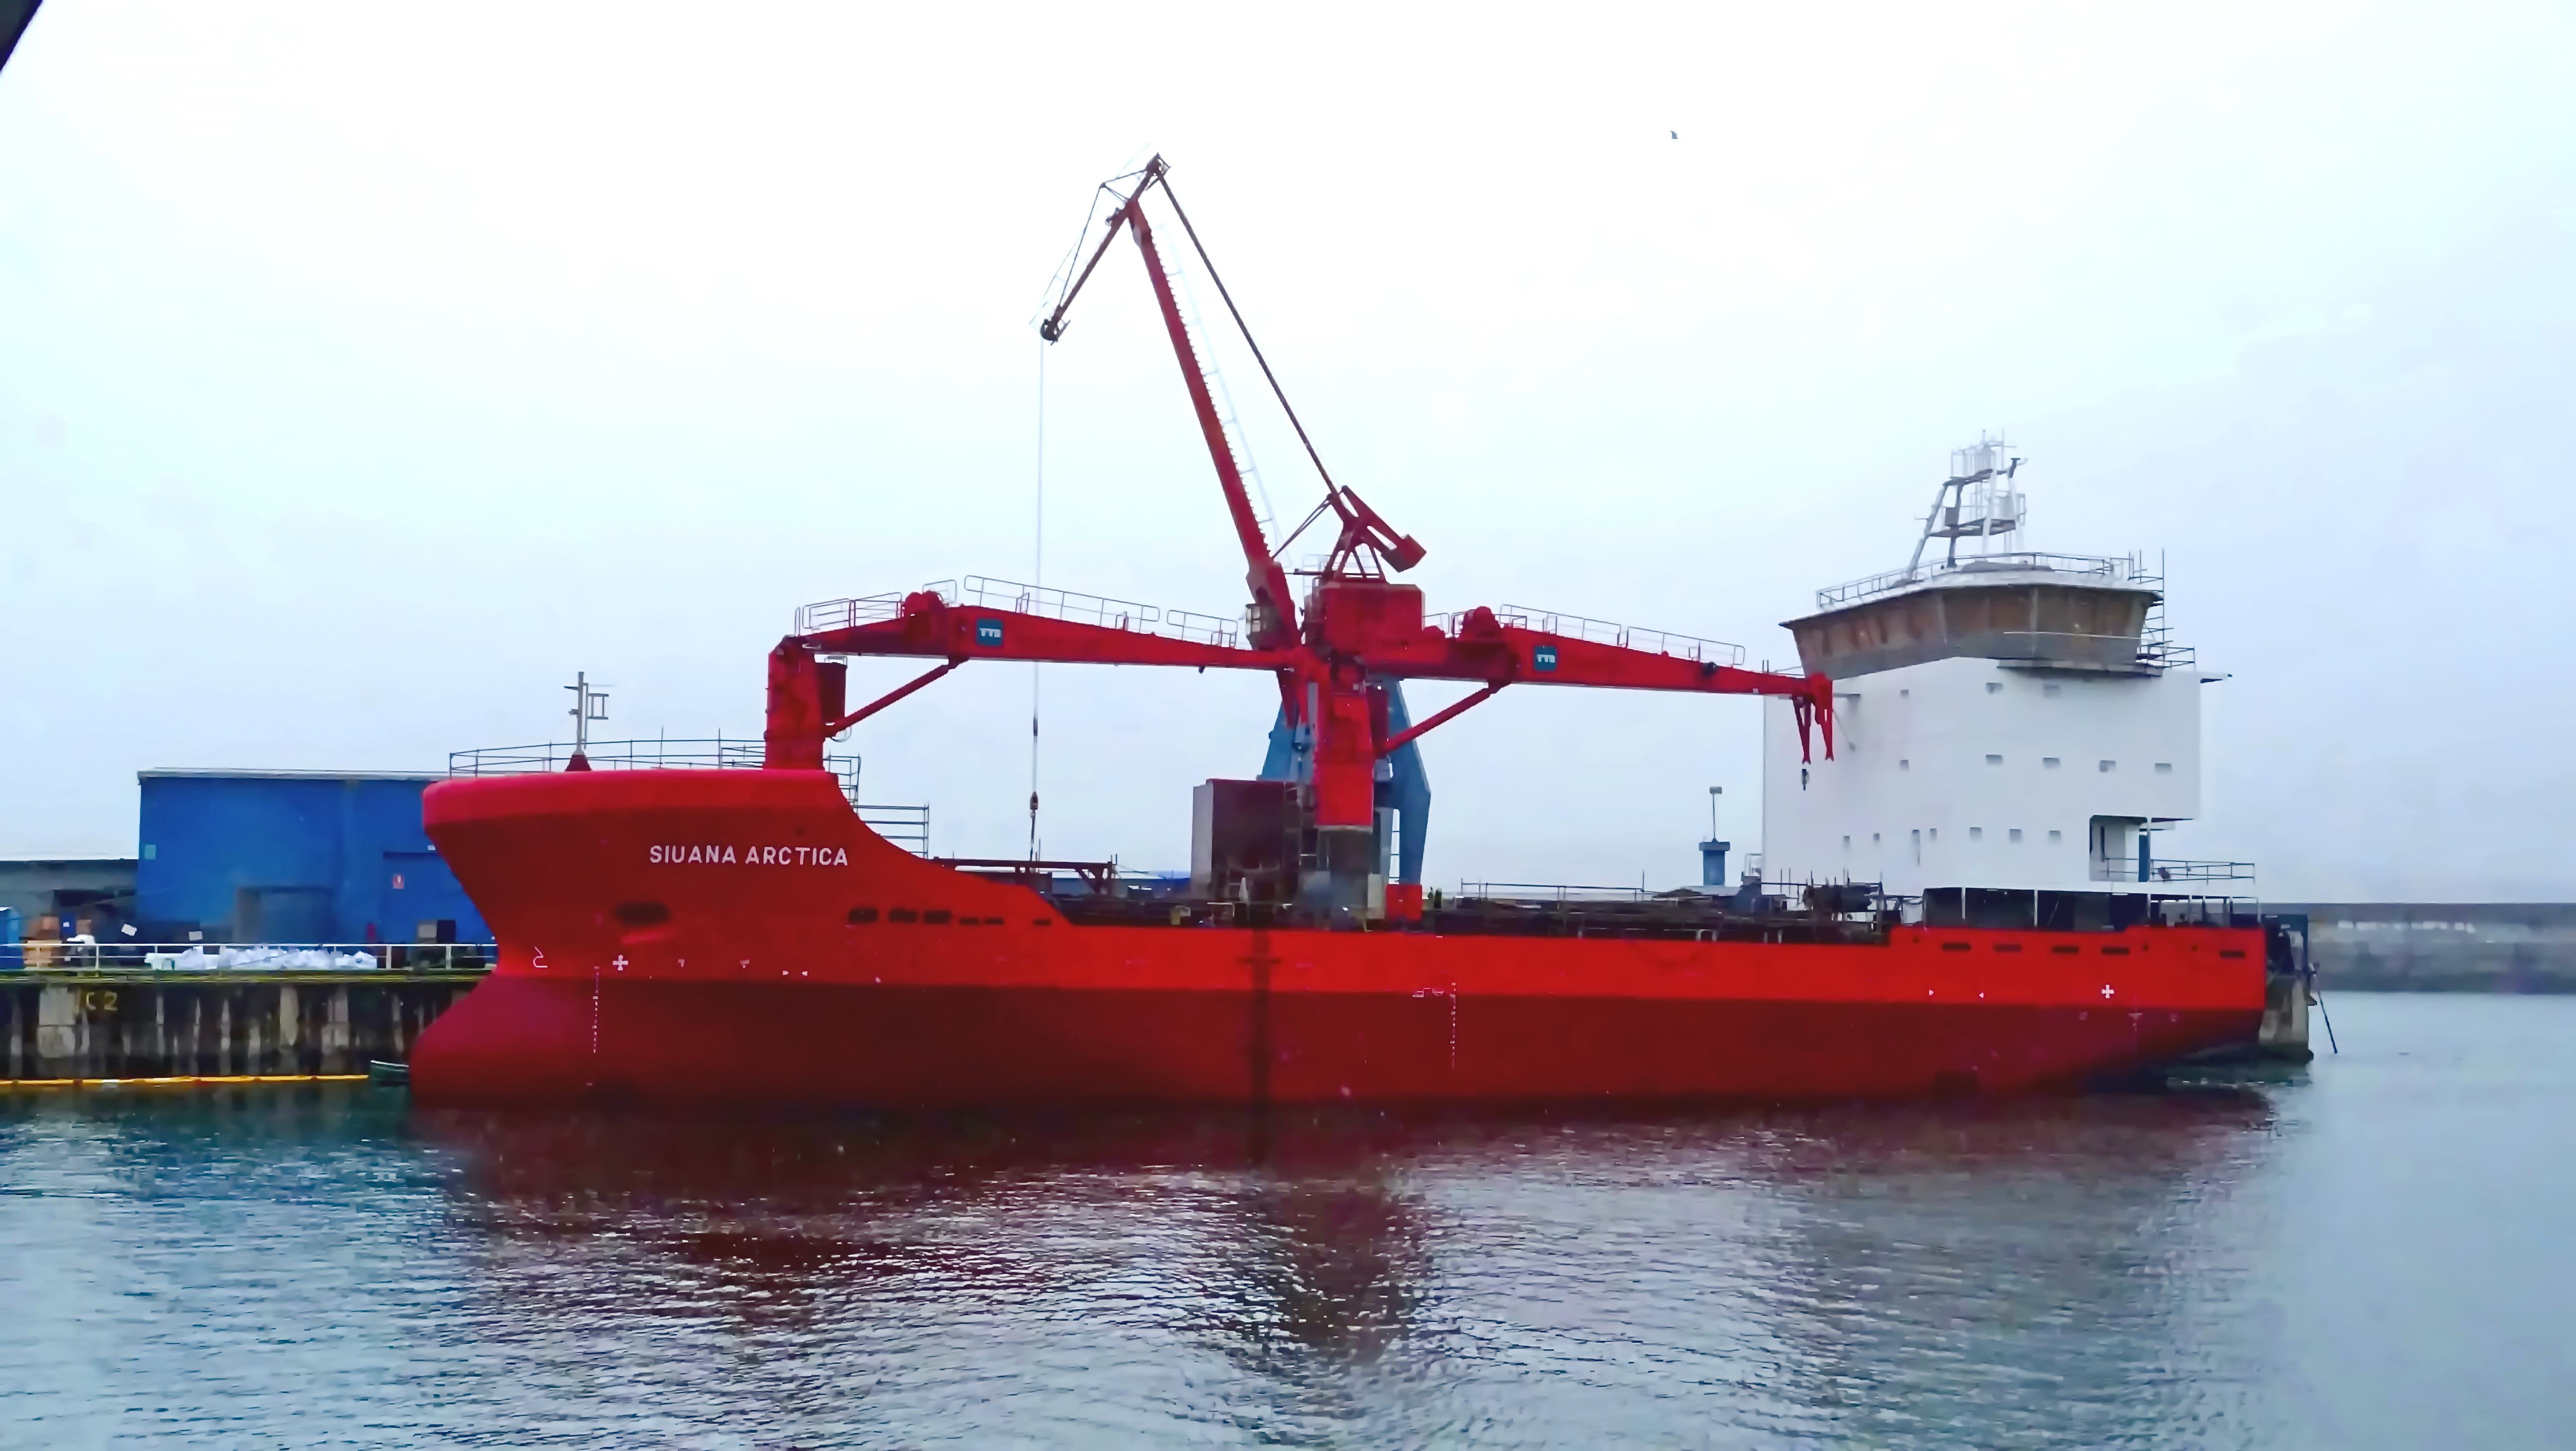 Zamakona Yards relies on FORAN to build two reefer vessels